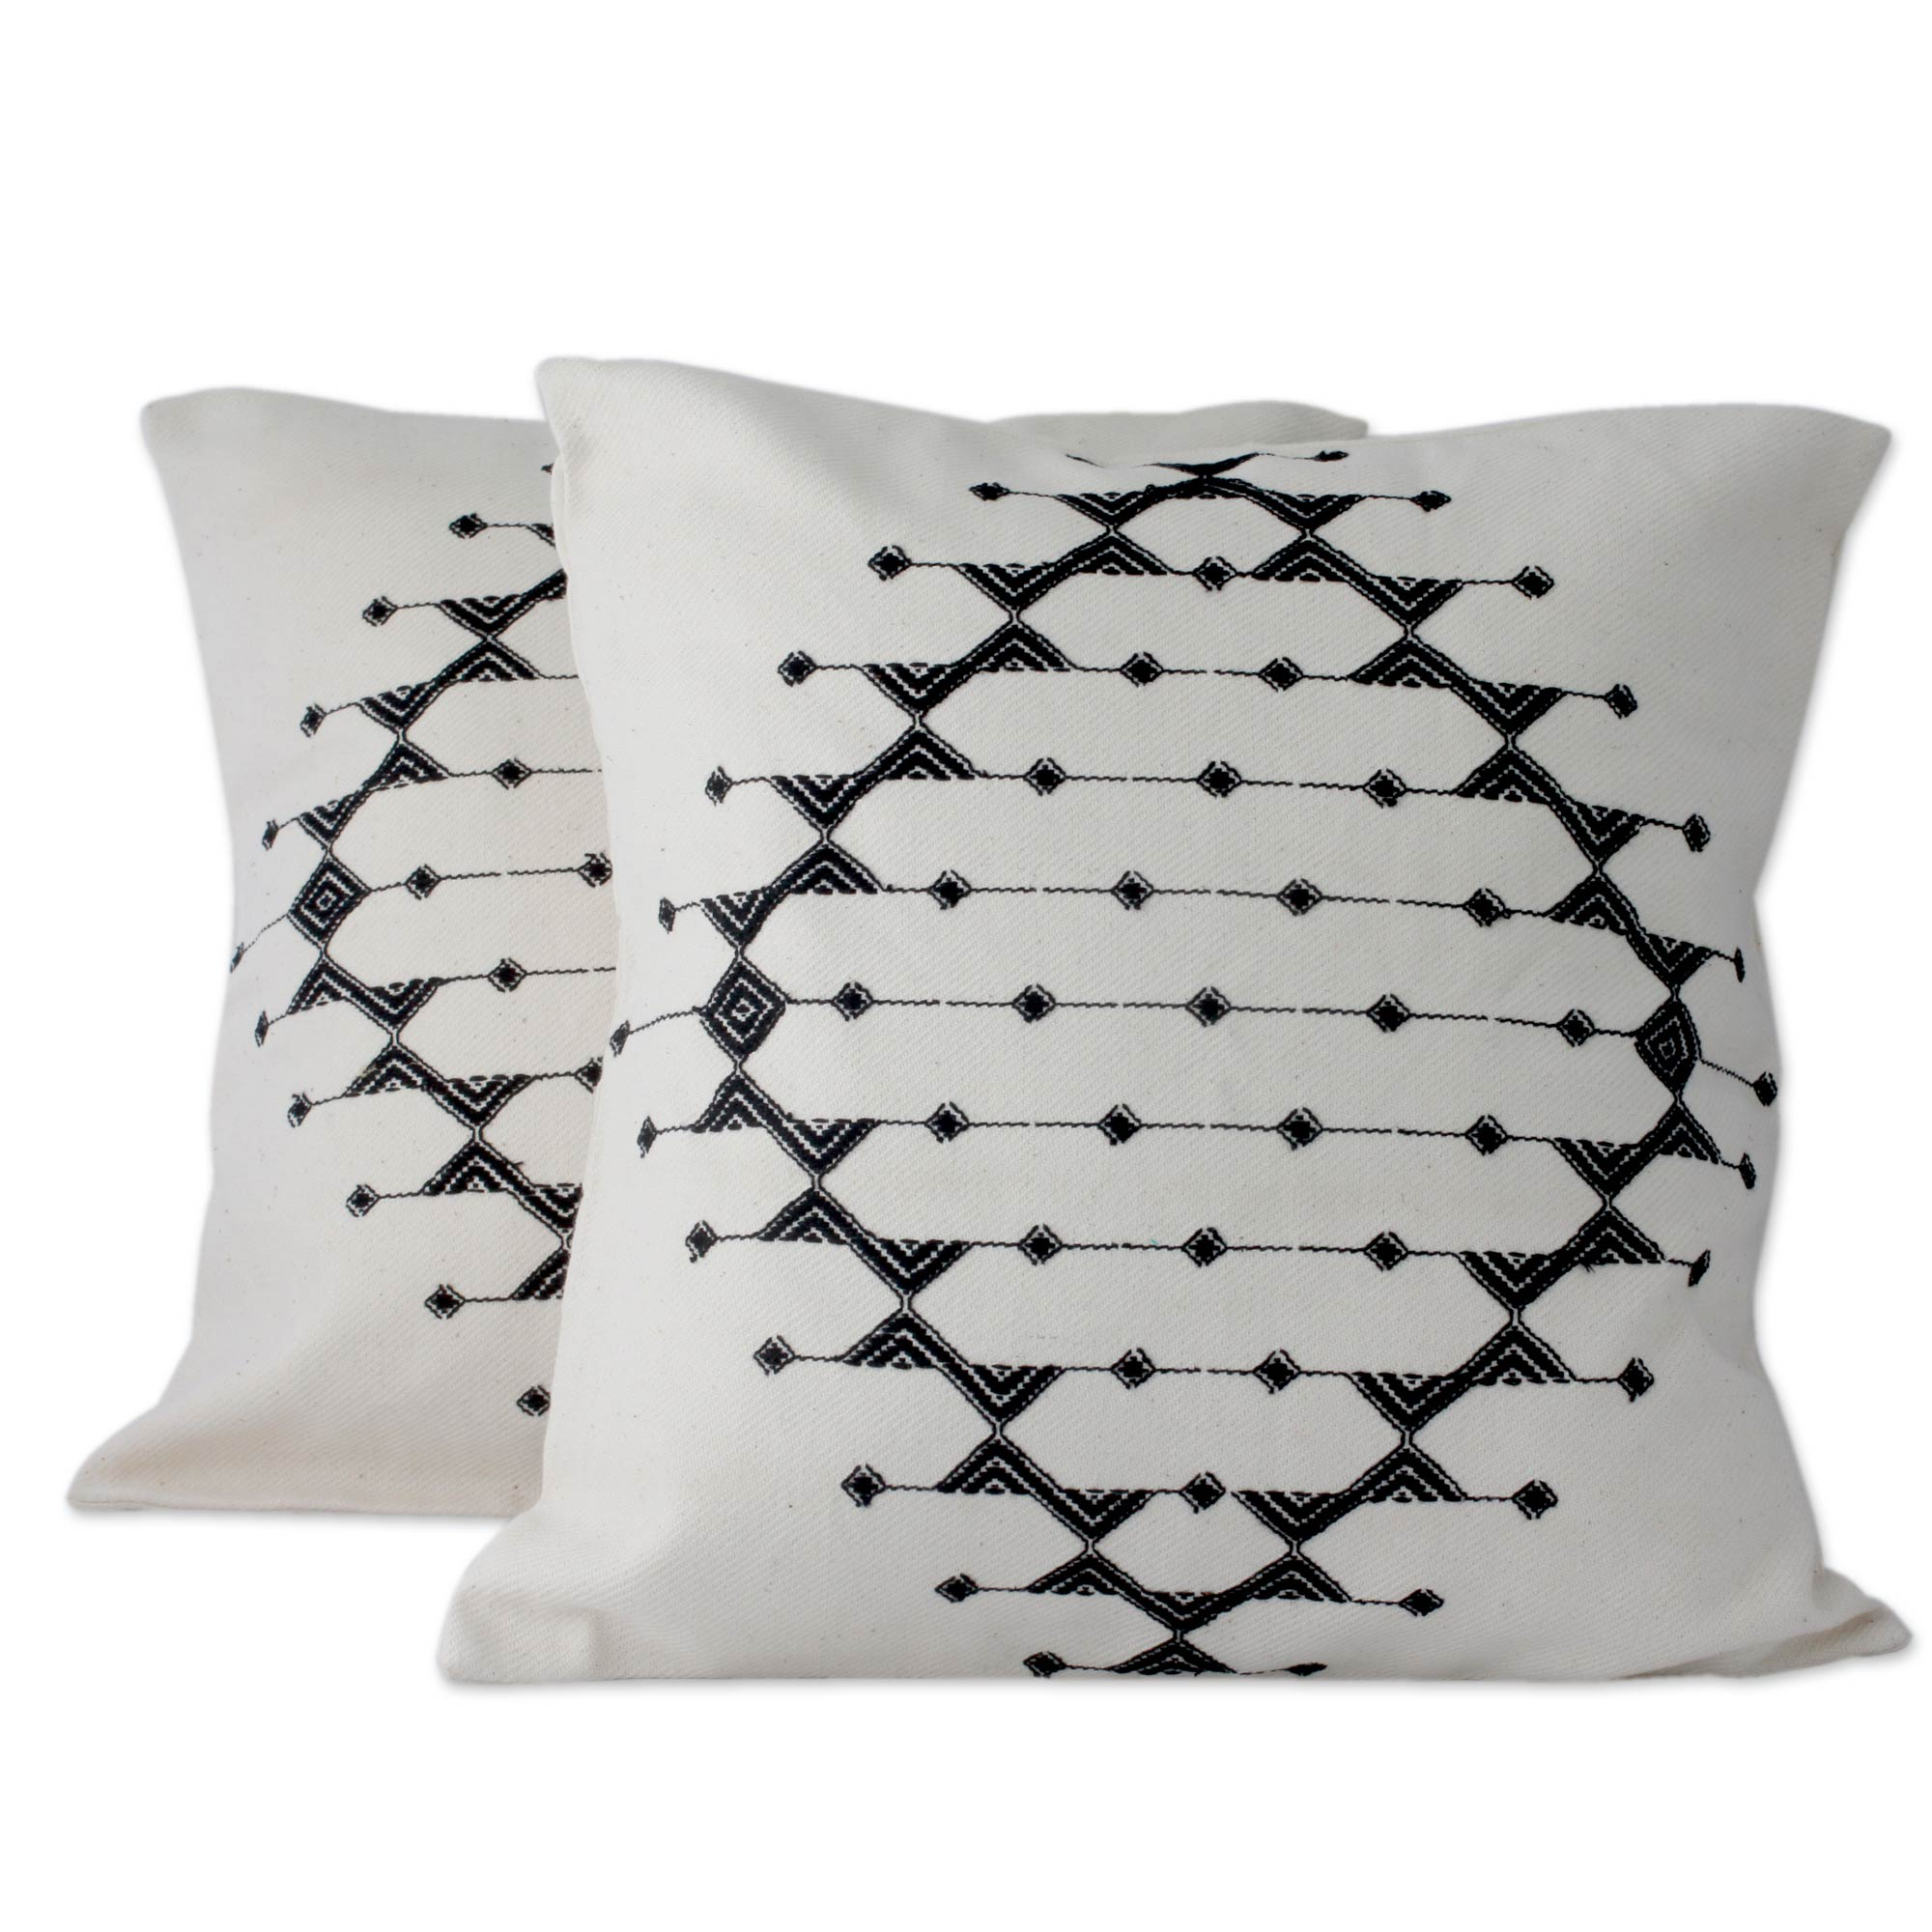 Monochrome Galaxy Cushion Covers